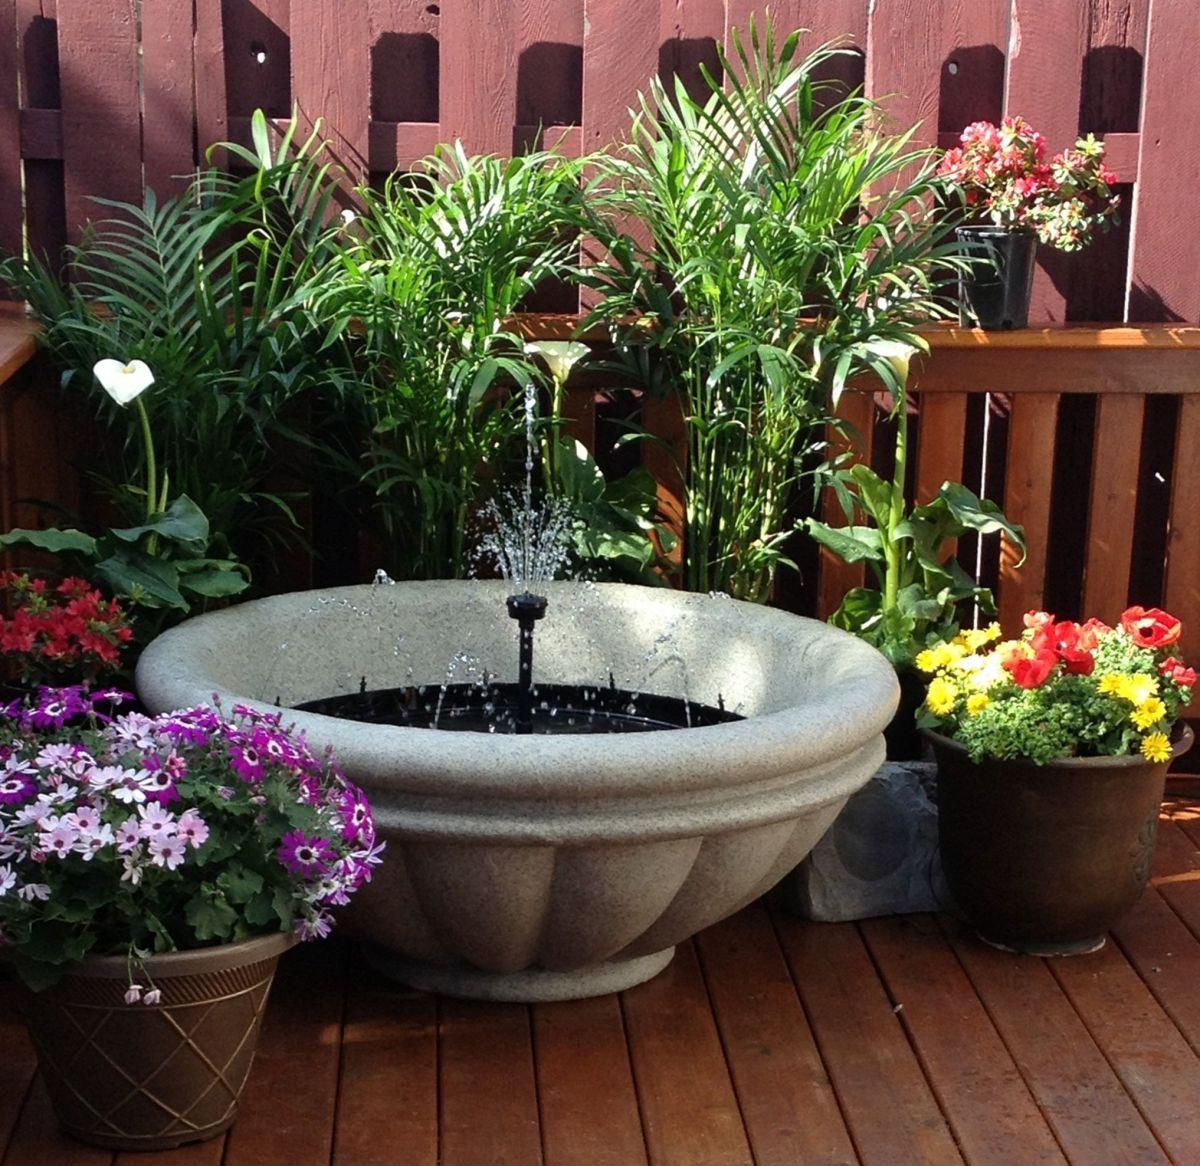 25+ Easy DIY Small Backyard Ideas For Your Home | Diy ...